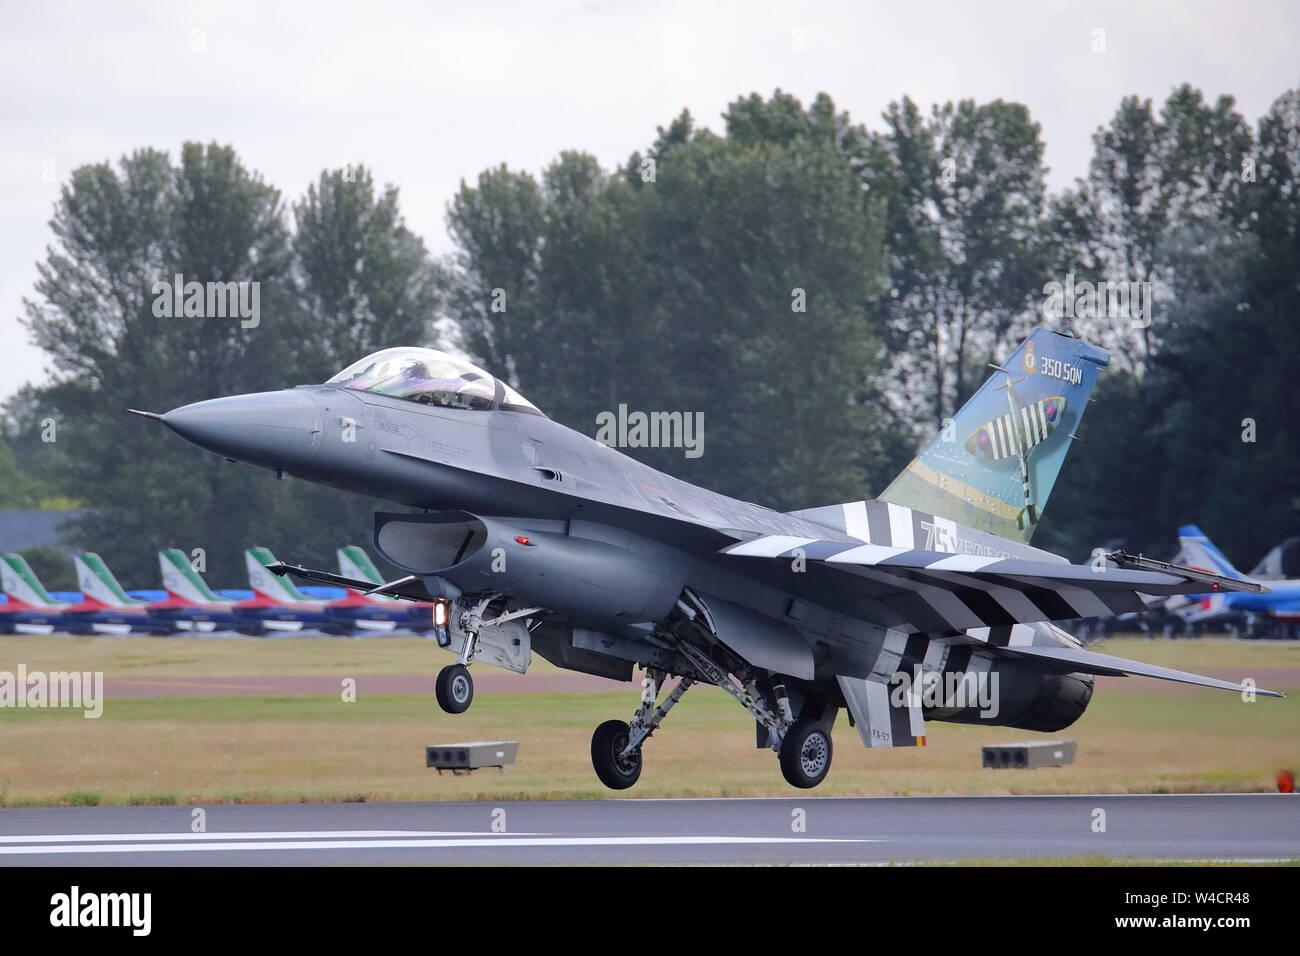 General Dynamics F-16 belgas en el Día-D colores aterrizar en el Royal International Air Tattoo RIAT 2019 a RAF Fairford, Gloucestershire, Reino Unido Foto de stock